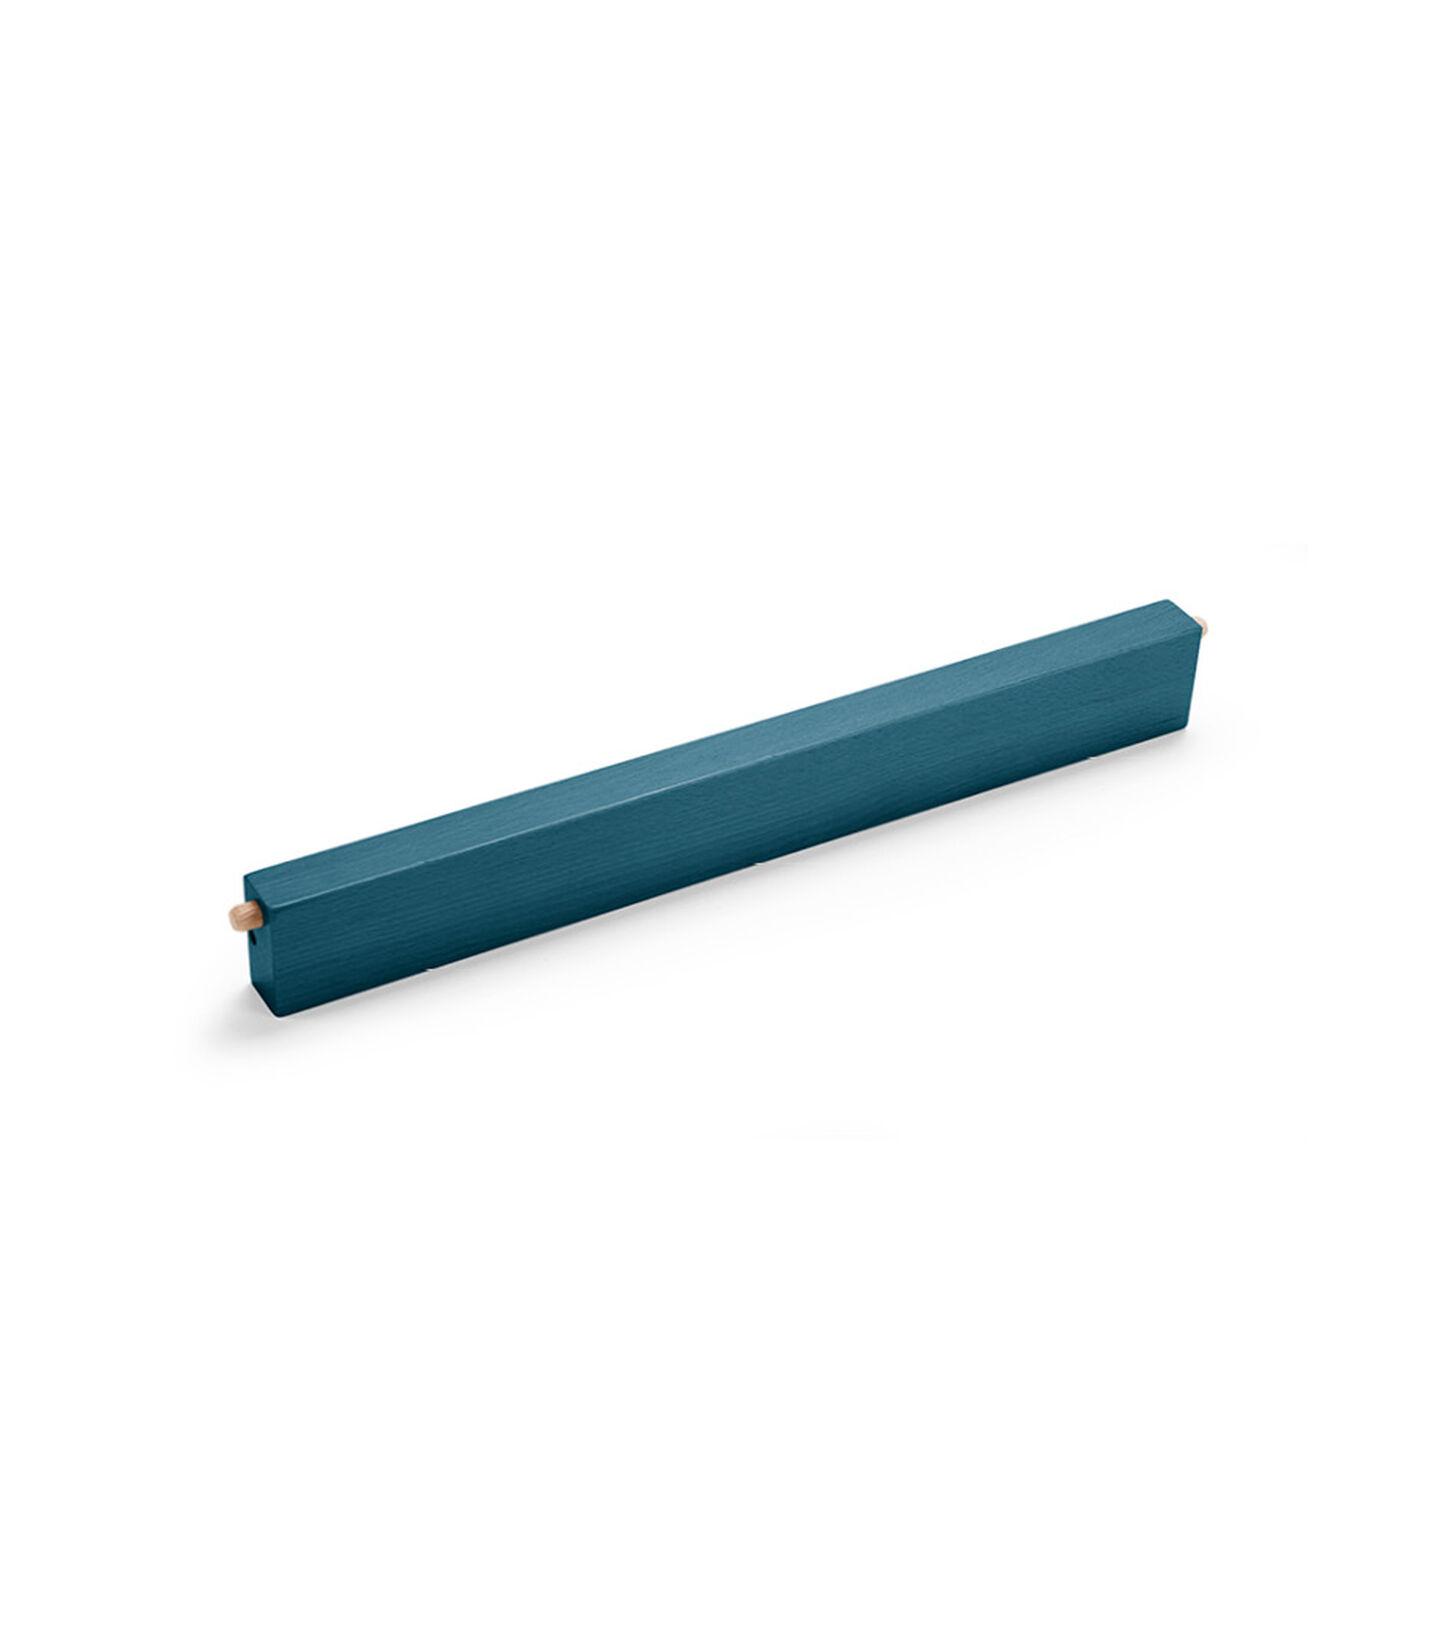 Tripp Trapp® Floorbrace Midnight Blue, Blu Notte, mainview view 2